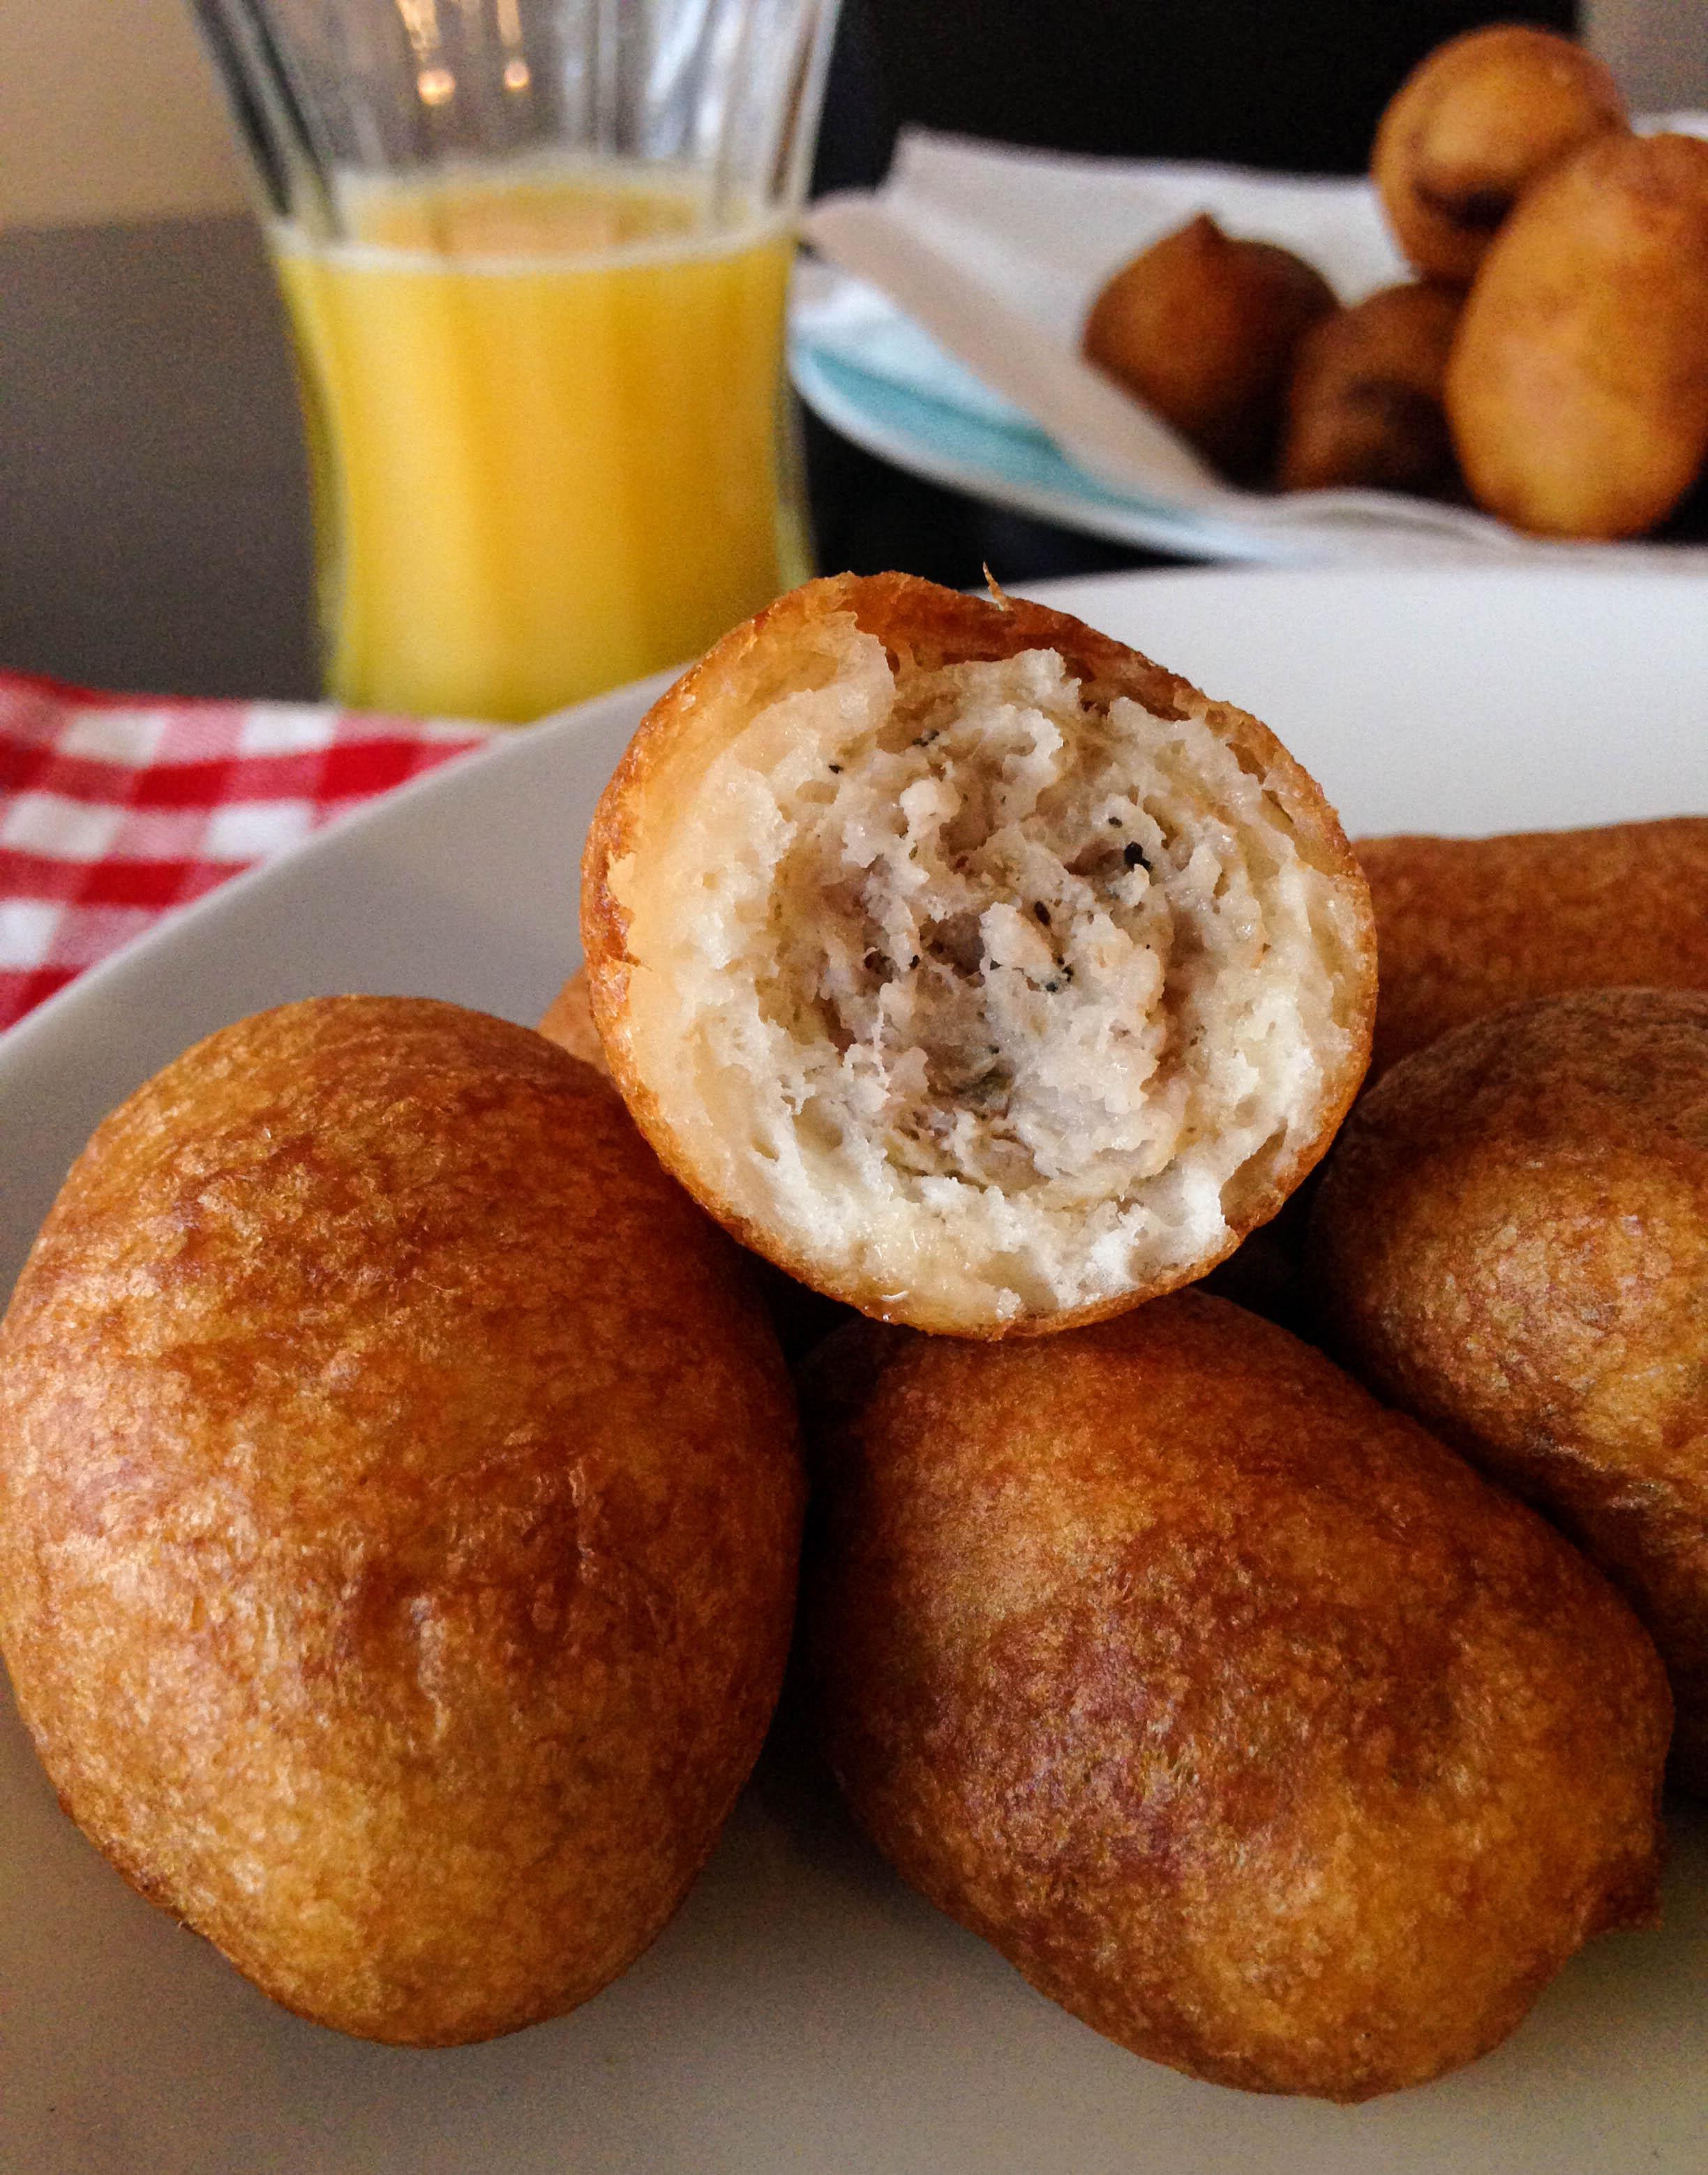 Crock Pot Sausage Bites - The Country Cook |Mini Sausage Bites